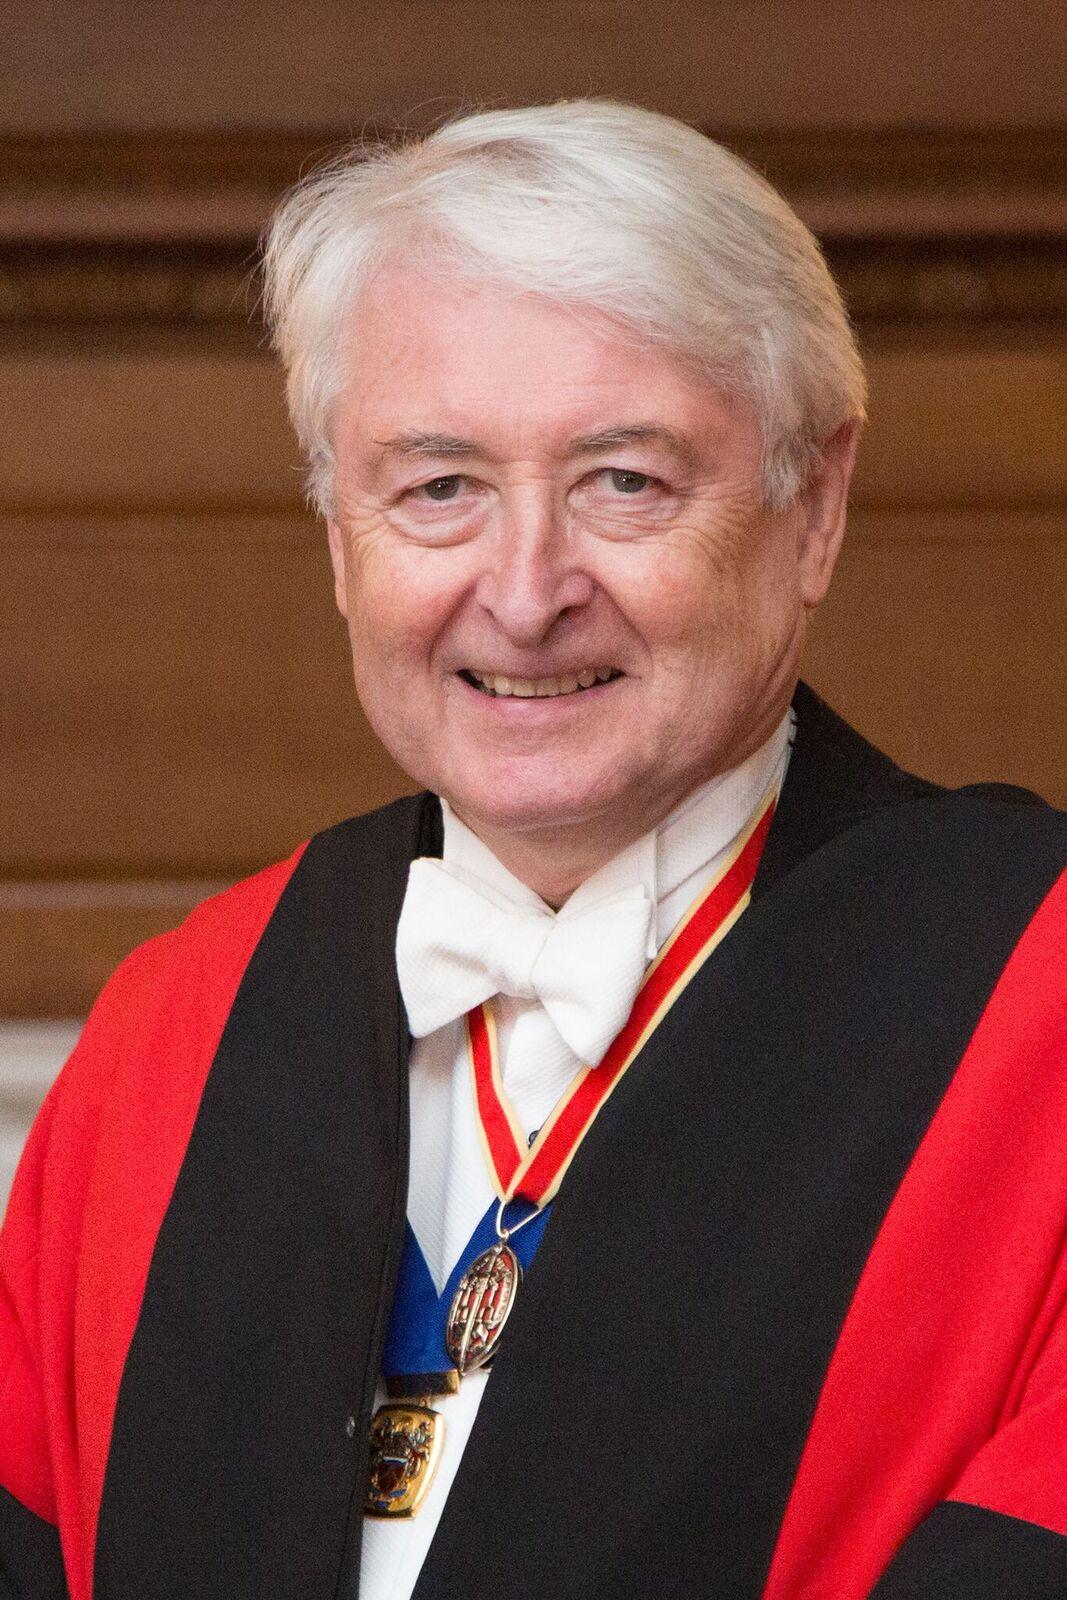 Sir Vivian Ramsey